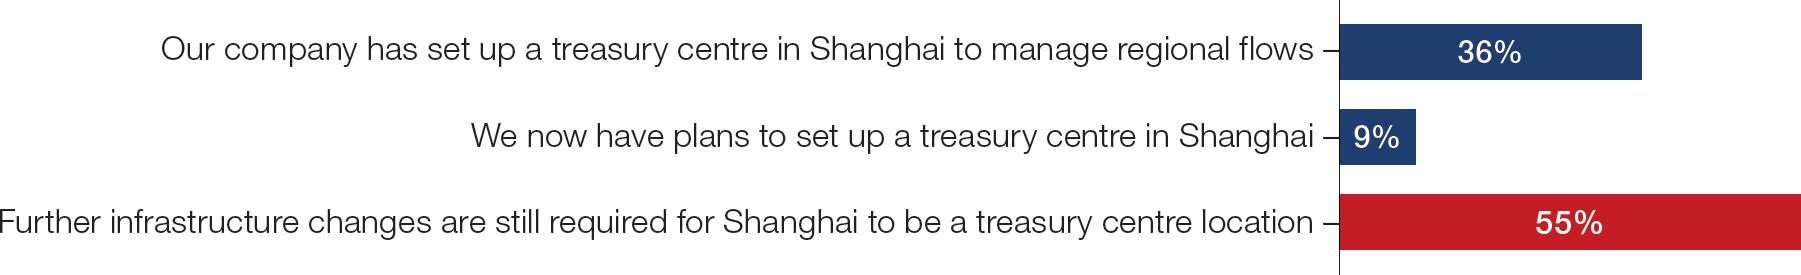 Chart 1: Treasurers views on the SFTZ